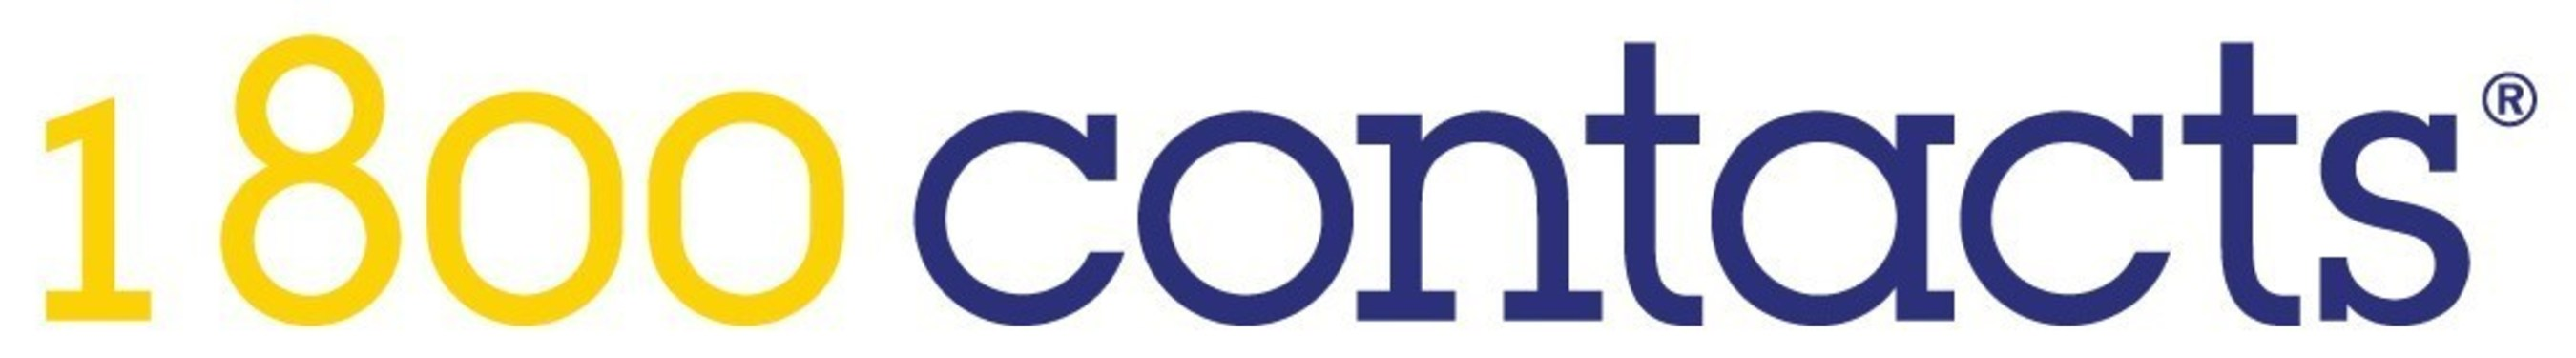 1-800 CONTACTS logo (PRNewsFoto/1-800 CONTACTS)